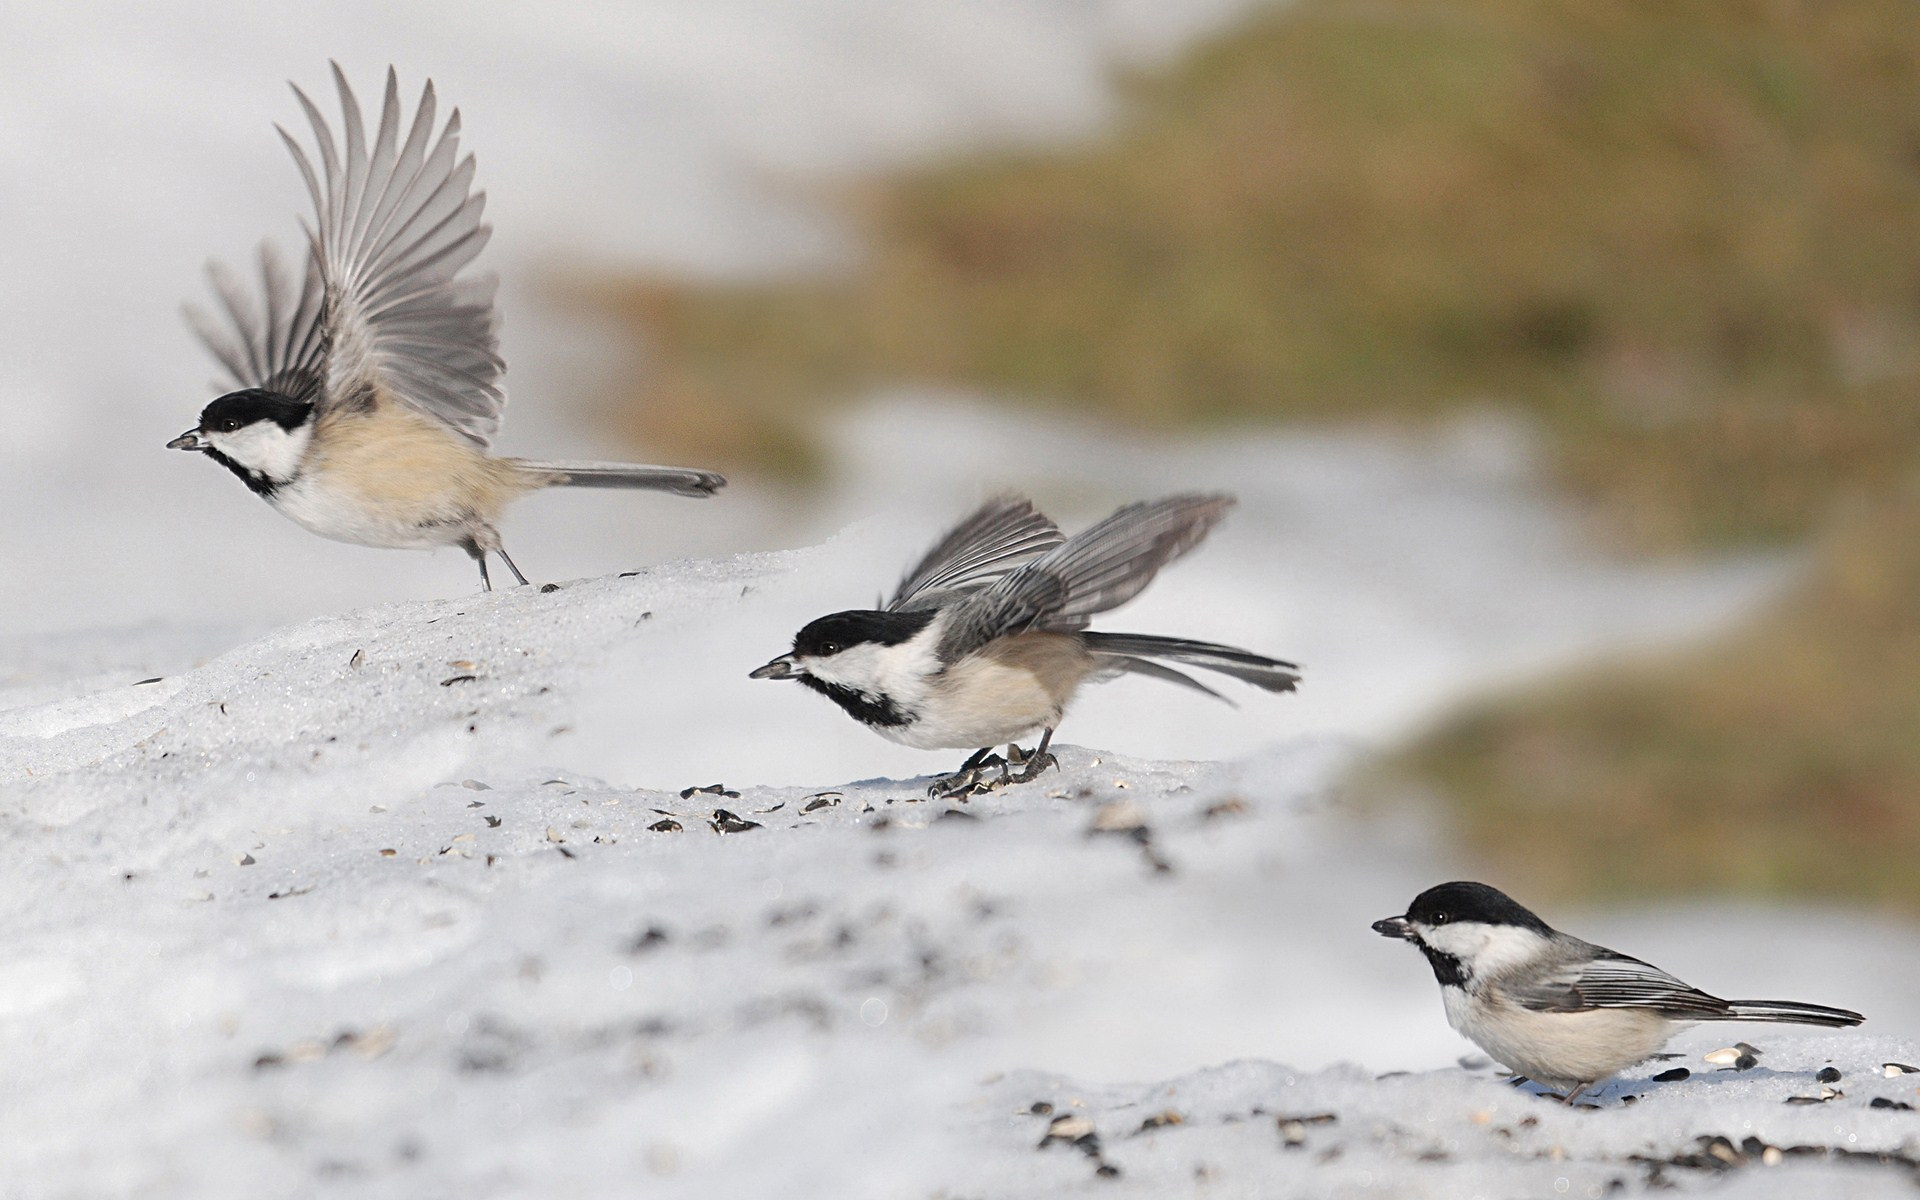 Sparrows Birds Fly